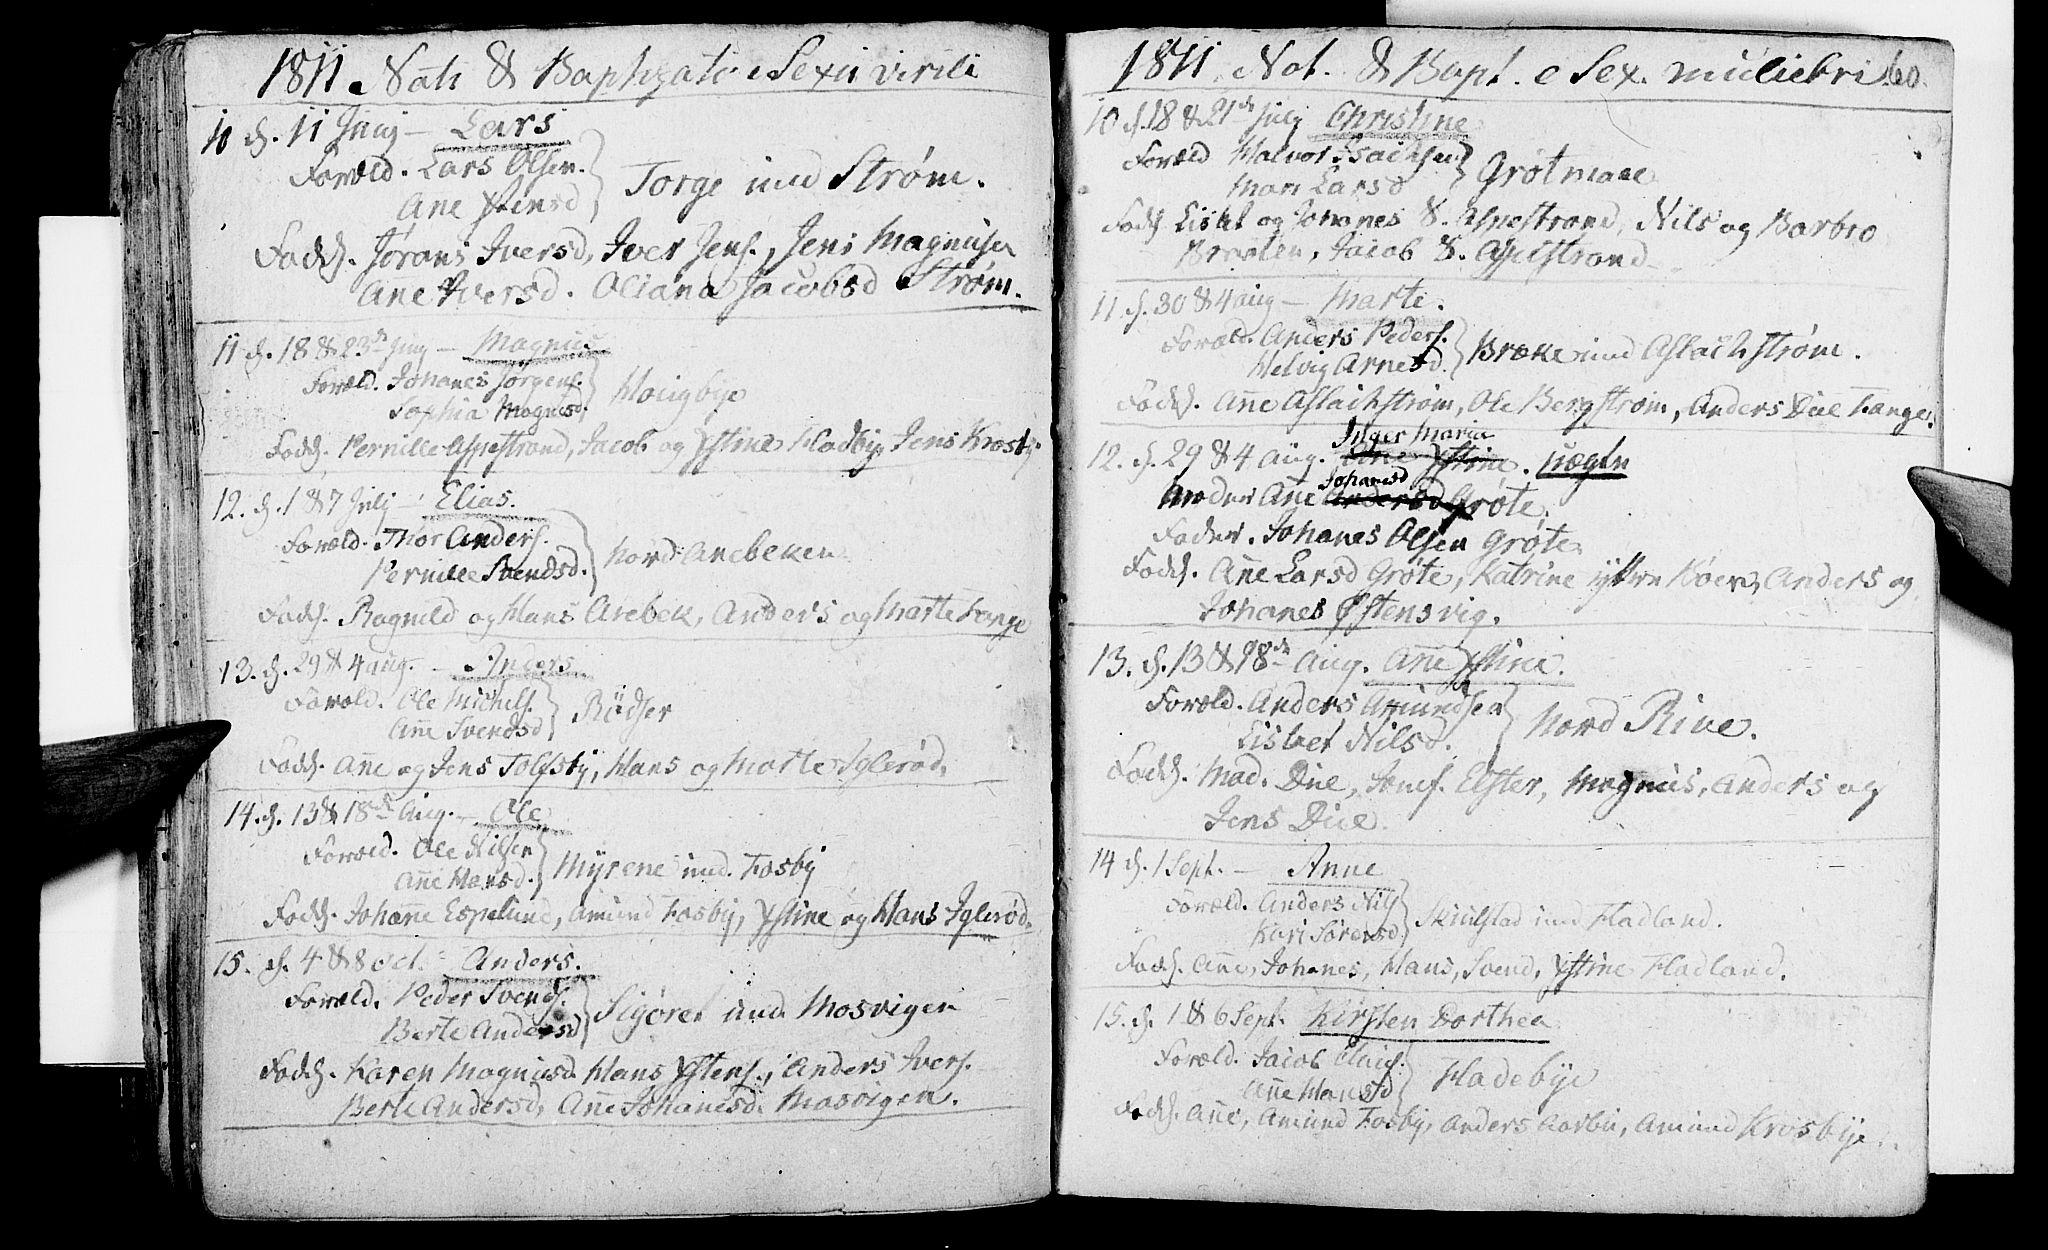 SAO, Aremark prestekontor Kirkebøker, F/Fa/L0004: Ministerialbok nr. I 4, 1796-1814, s. 60